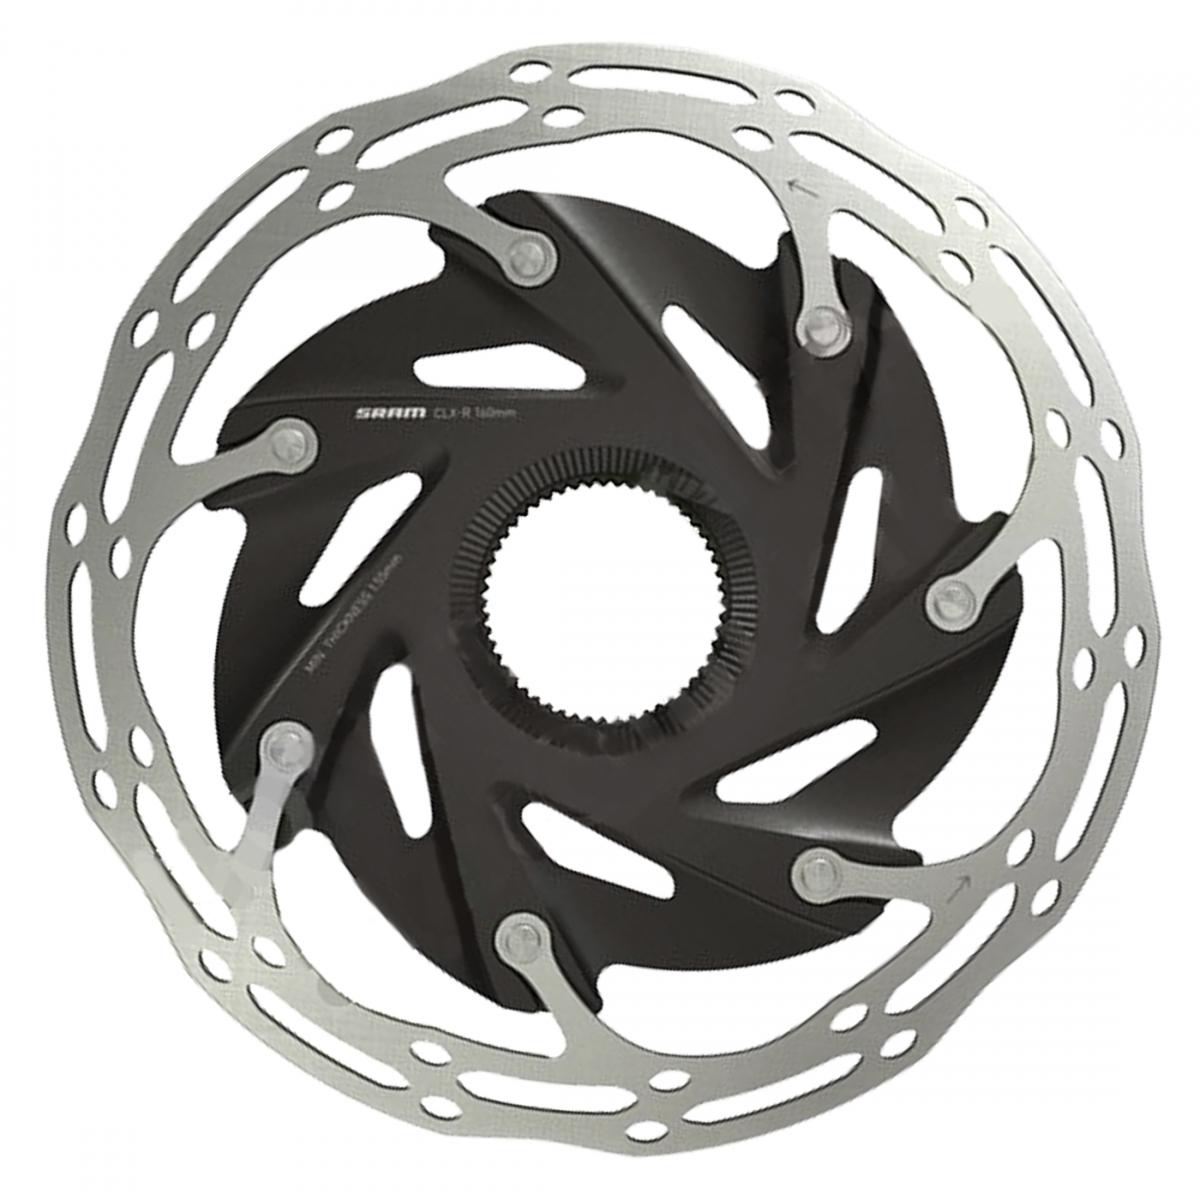 Sram Brake Part Disc Rotor 180 C-Line 6B 2-Piece Rounded Bk